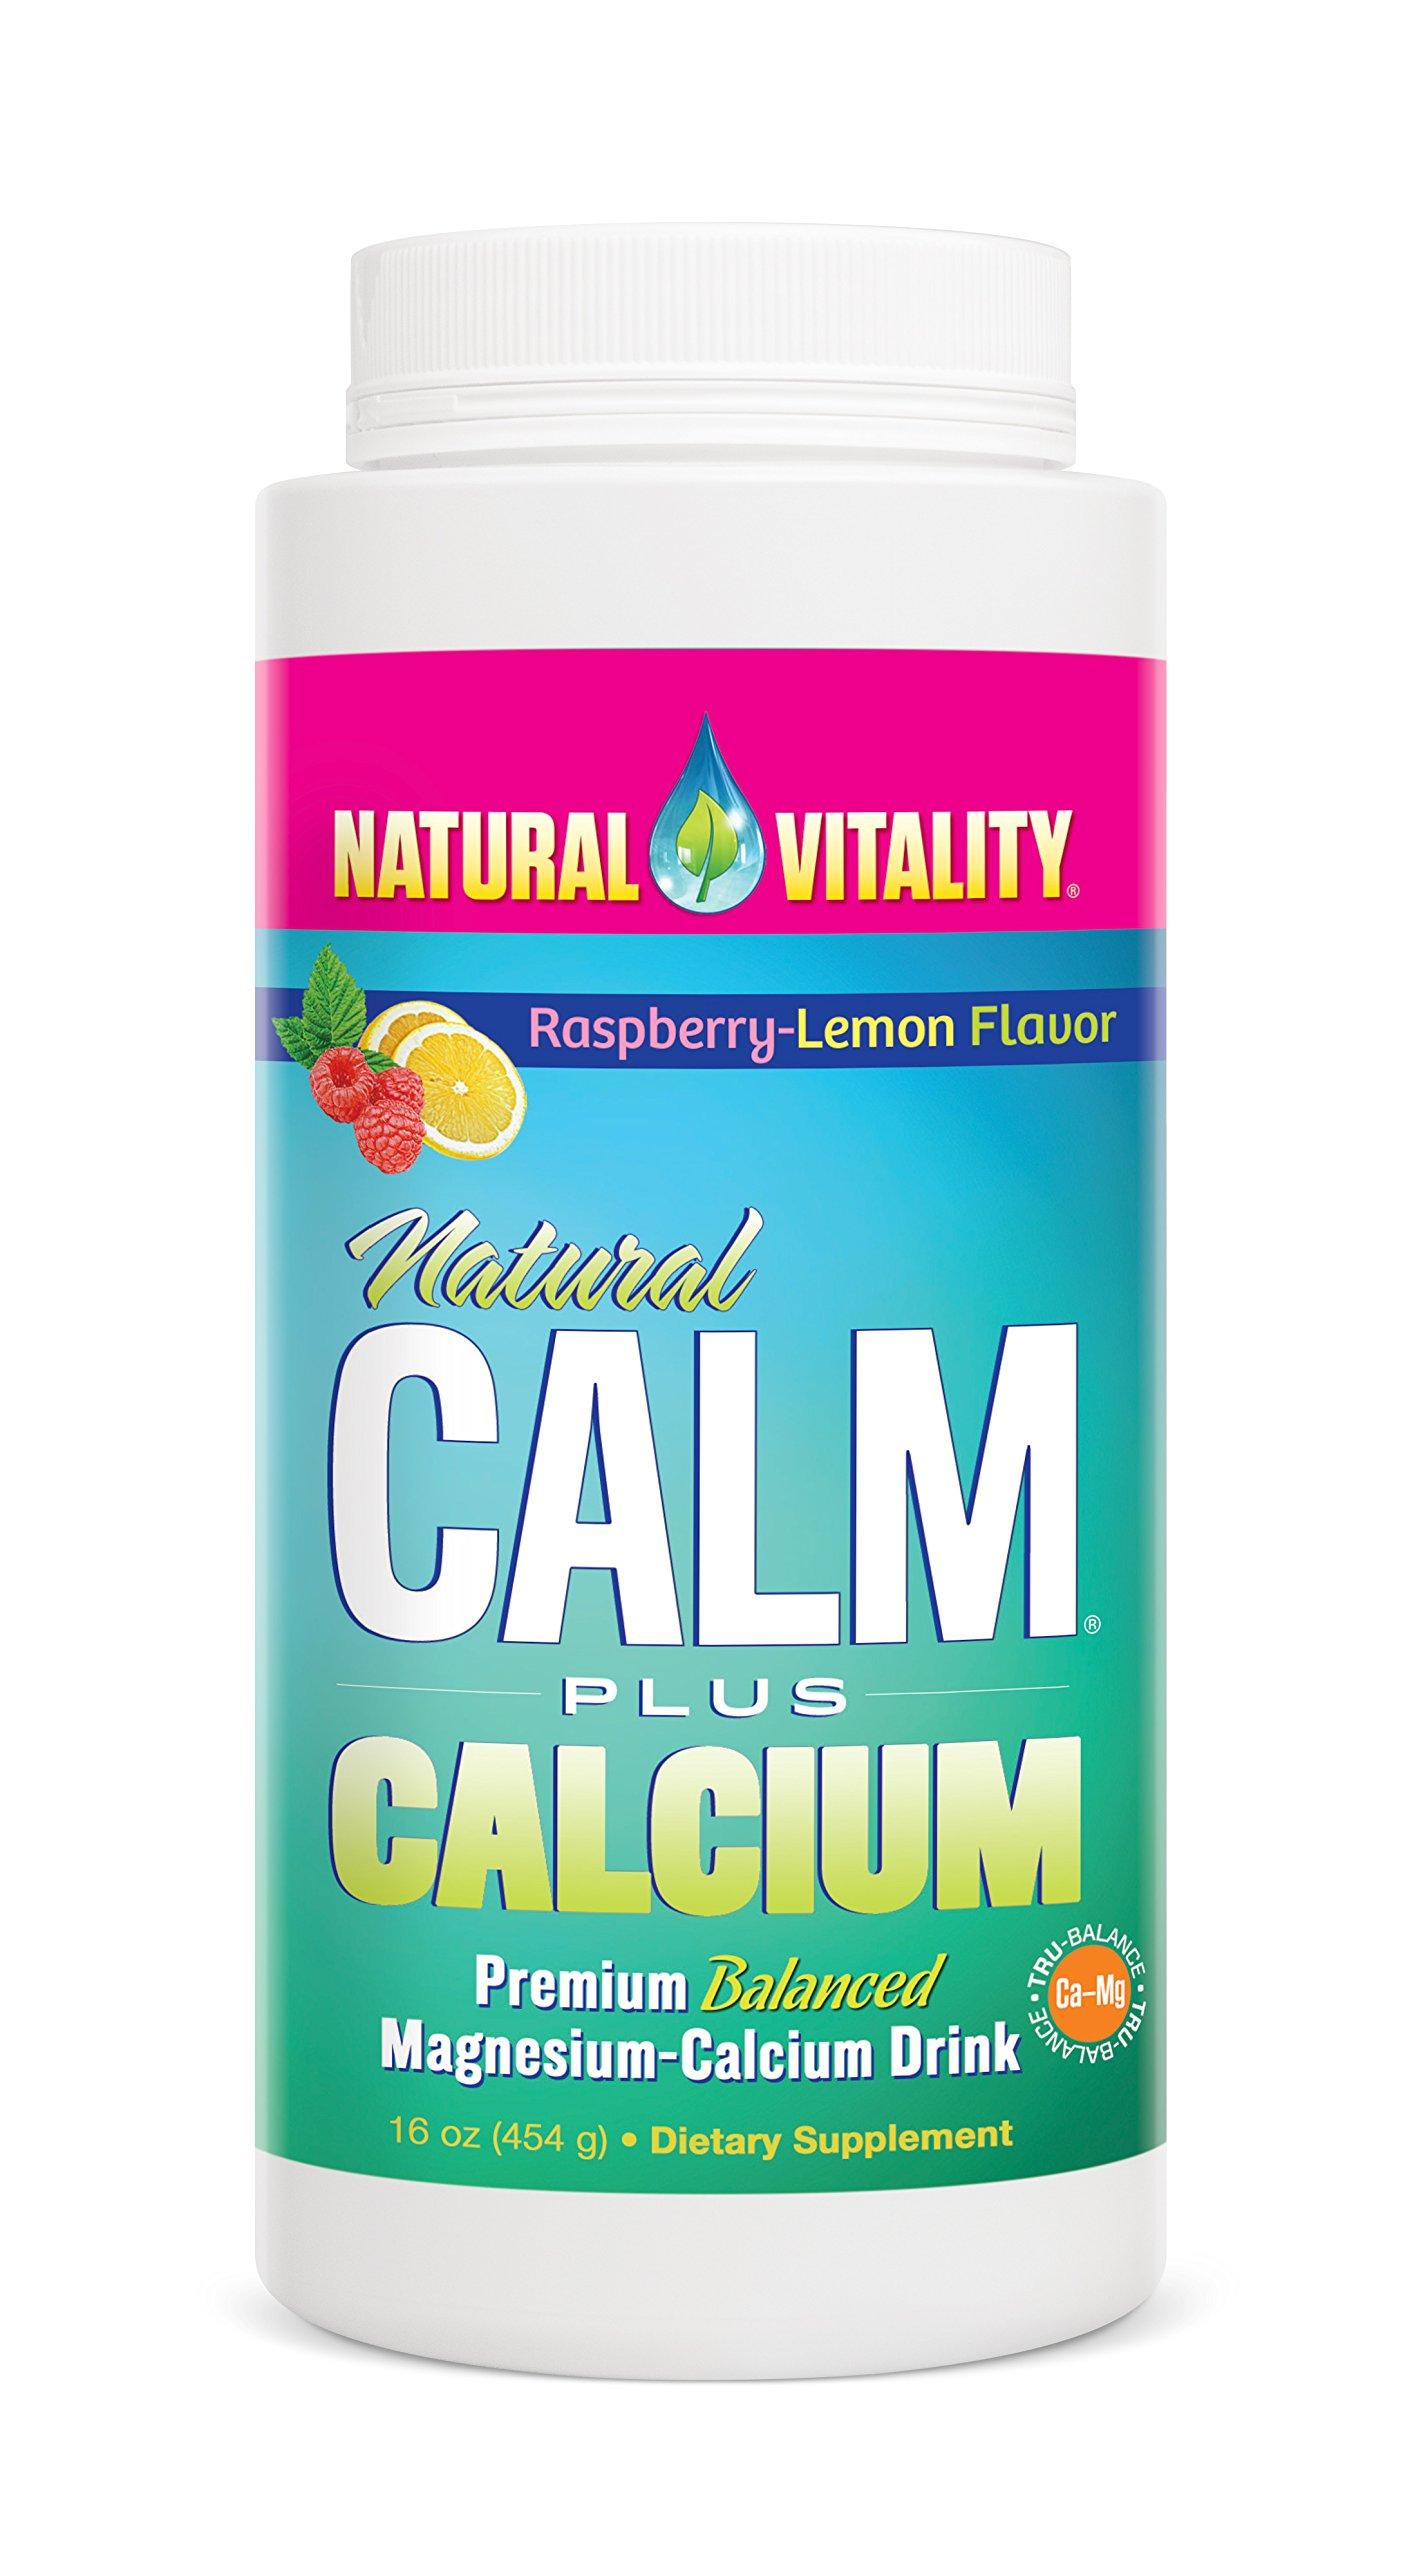 Natural Vitality Natural Calm Plus Calcium Magnesium Anti Stress, Organic, Raspbery Lemon, 16 oz